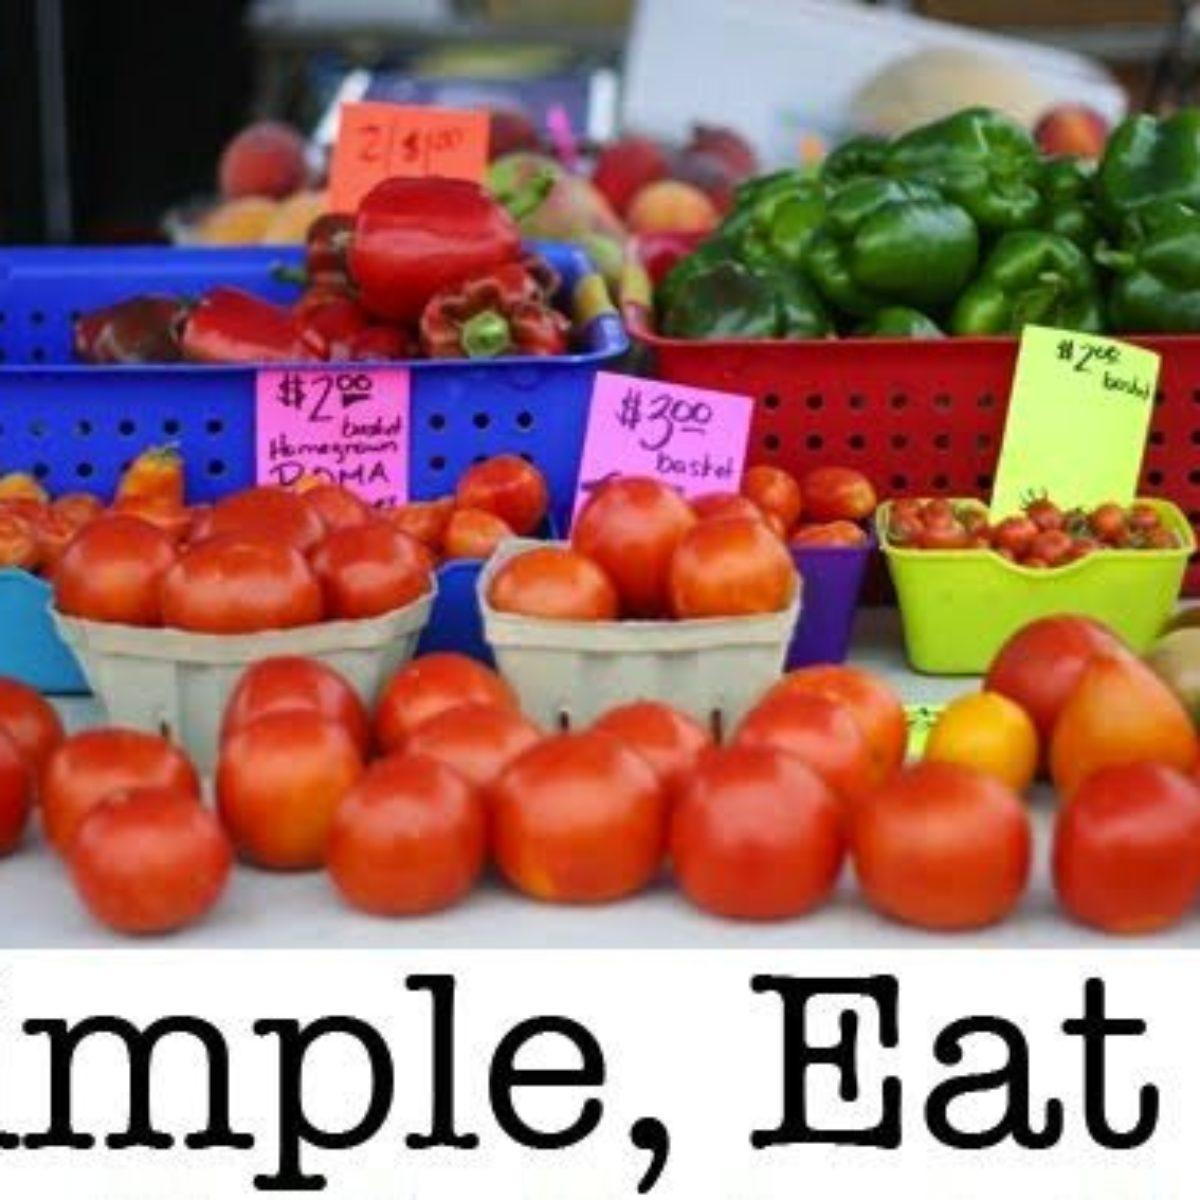 dieta vegana per perdere peso in un mese